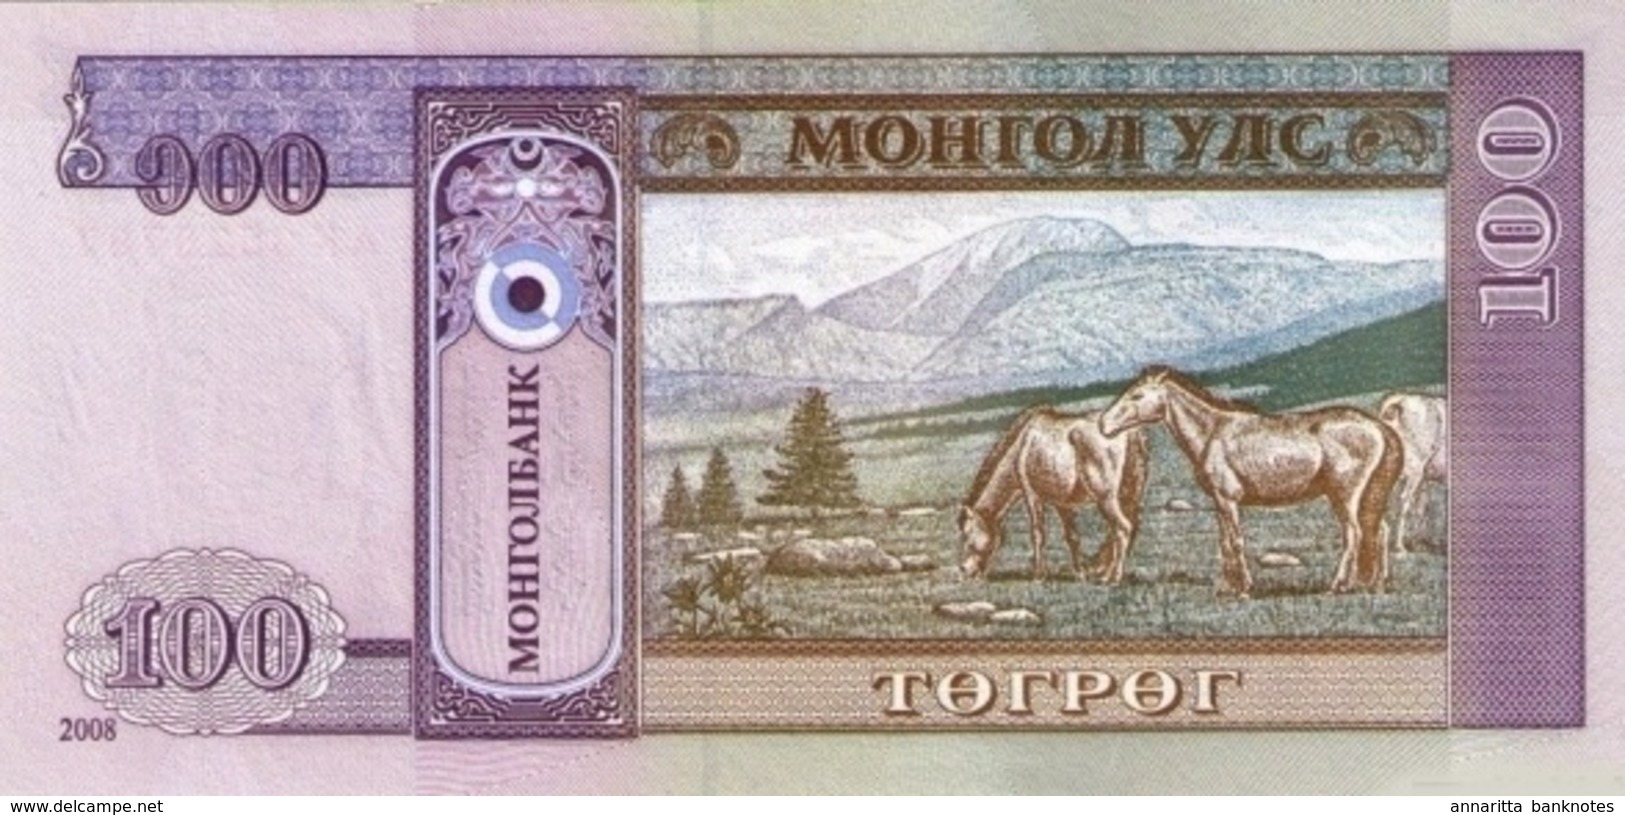 MONGOLIE 100 ТӨГРӨГ (TÖGRÖG) 2008 P-65b NEUF  [MN422b] - Mongolia